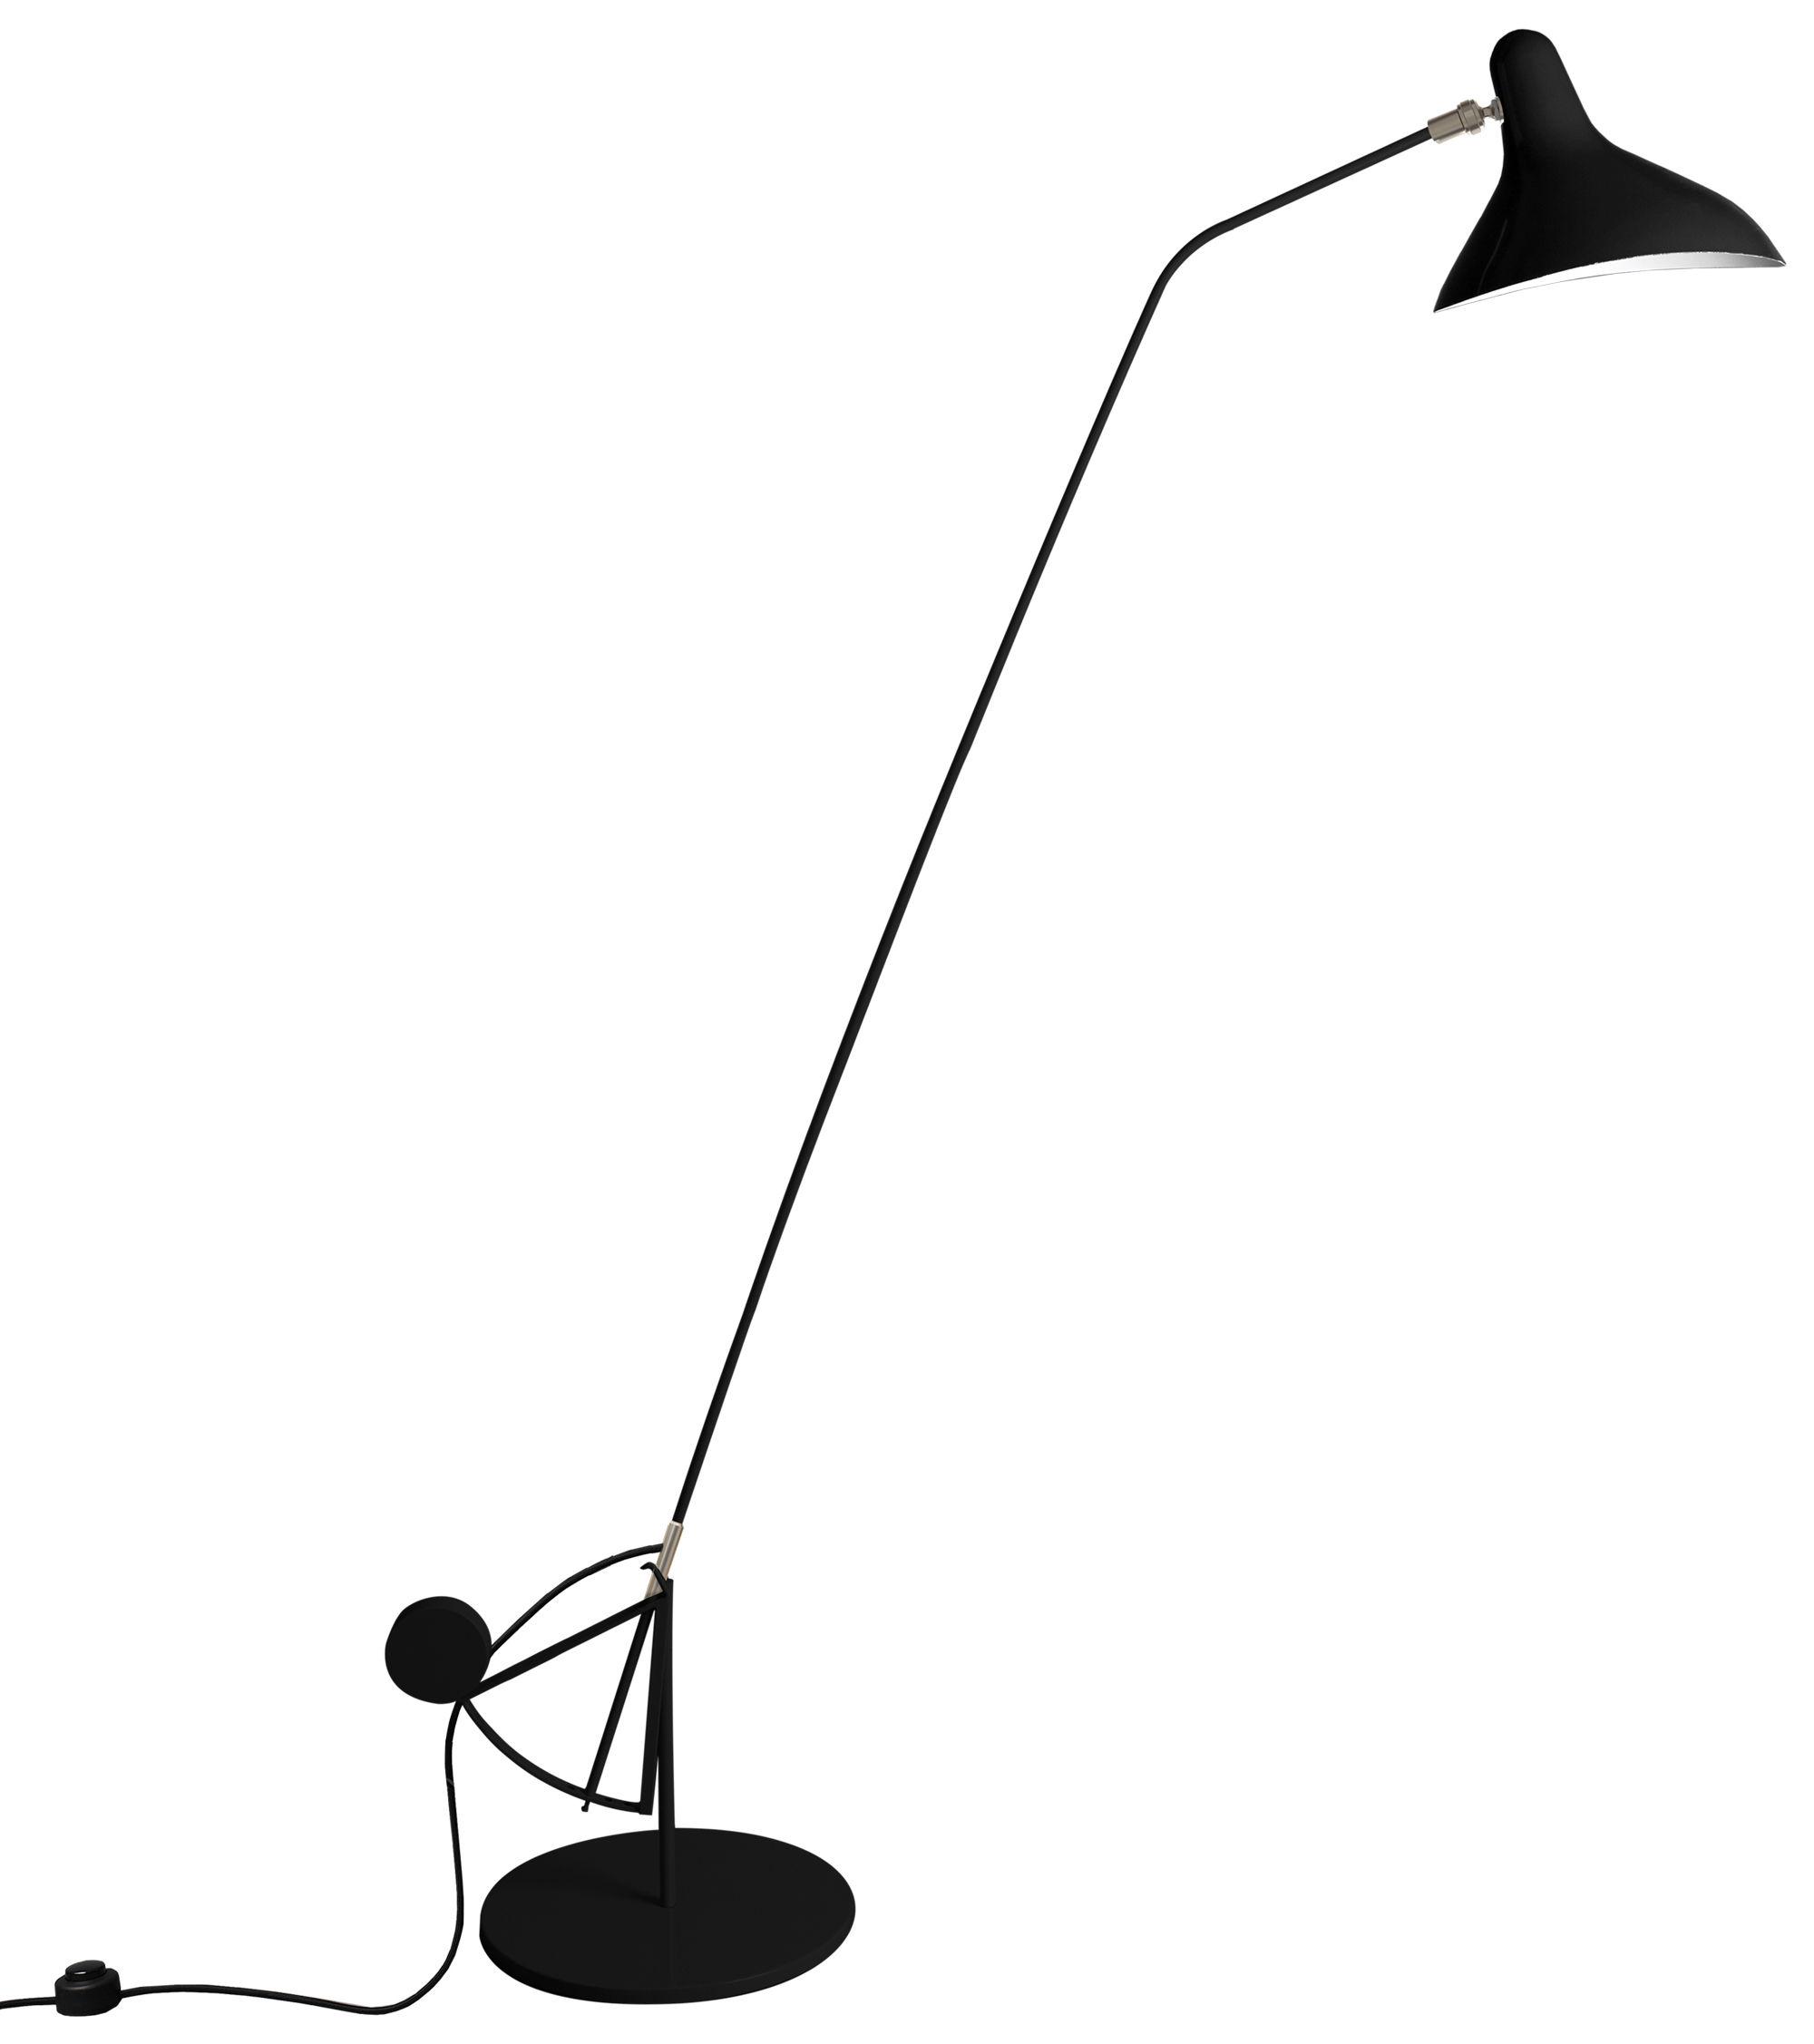 Lighting - Floor lamps - Mantis BS1 B Floor lamp by DCW éditions - Black / Black lampshade - Aluminium, Steel